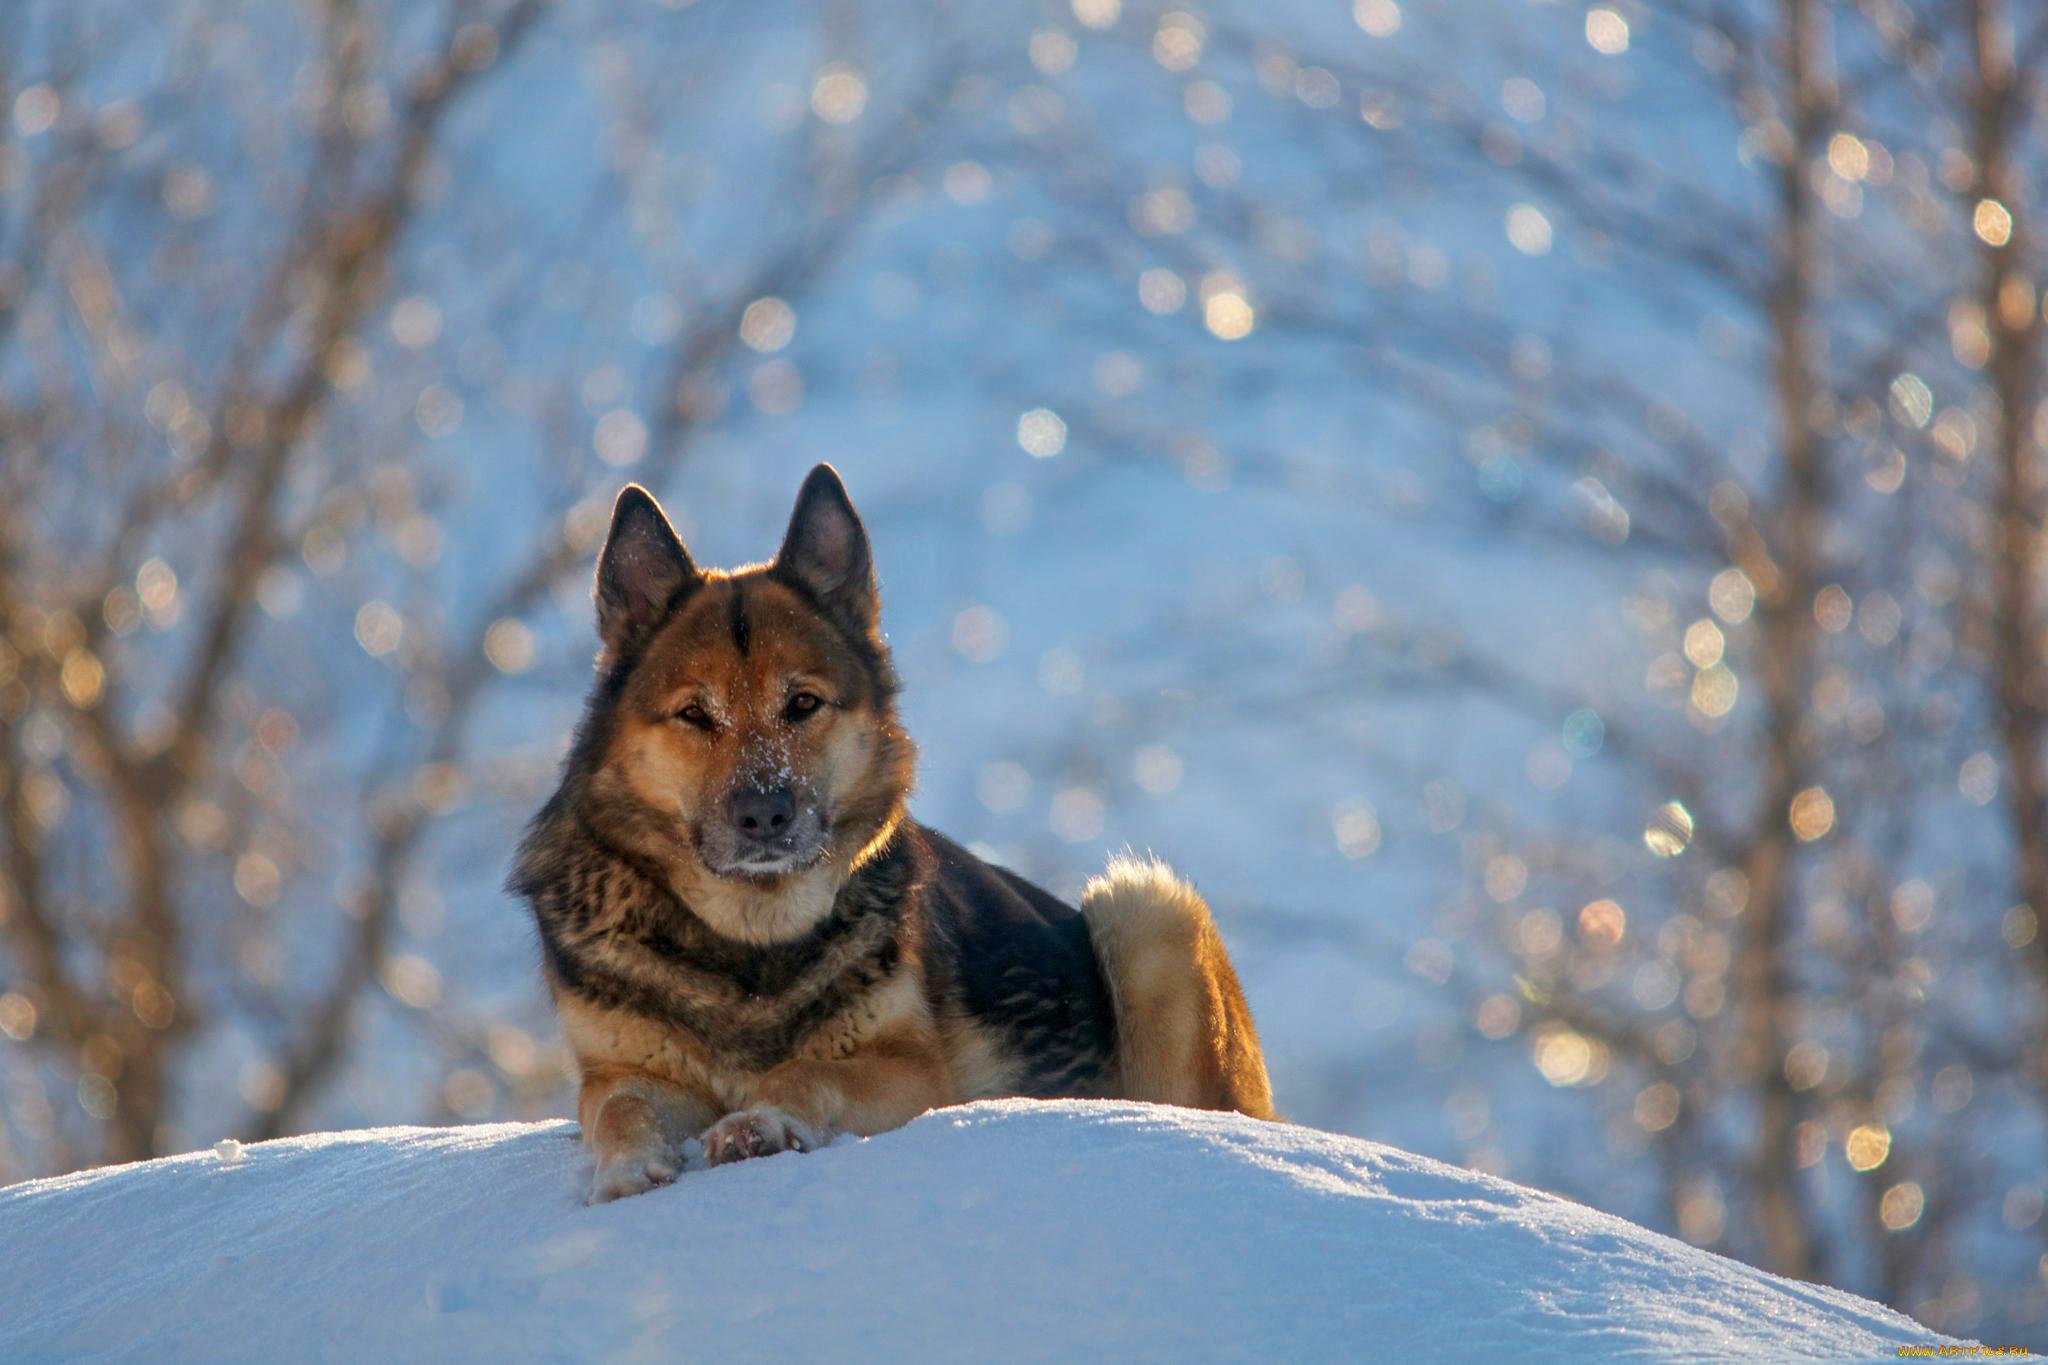 природа животные собака немецка овчарка nature animals dog the German shepherd  № 1004480 загрузить